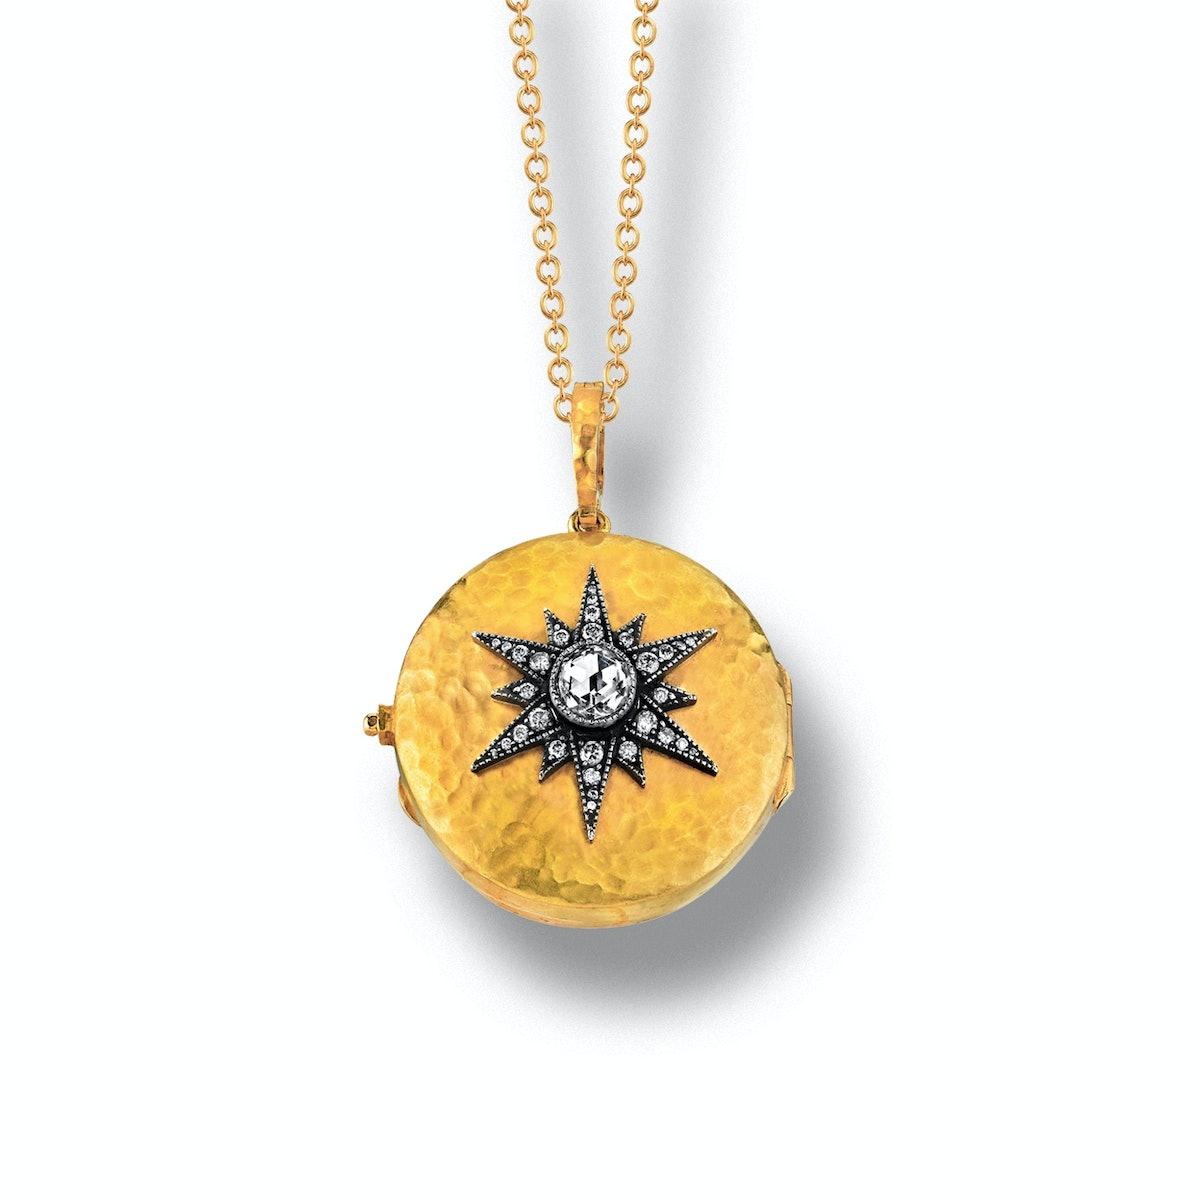 Arman Sarkisyan 22k yellow gold, silver, and diamond locket